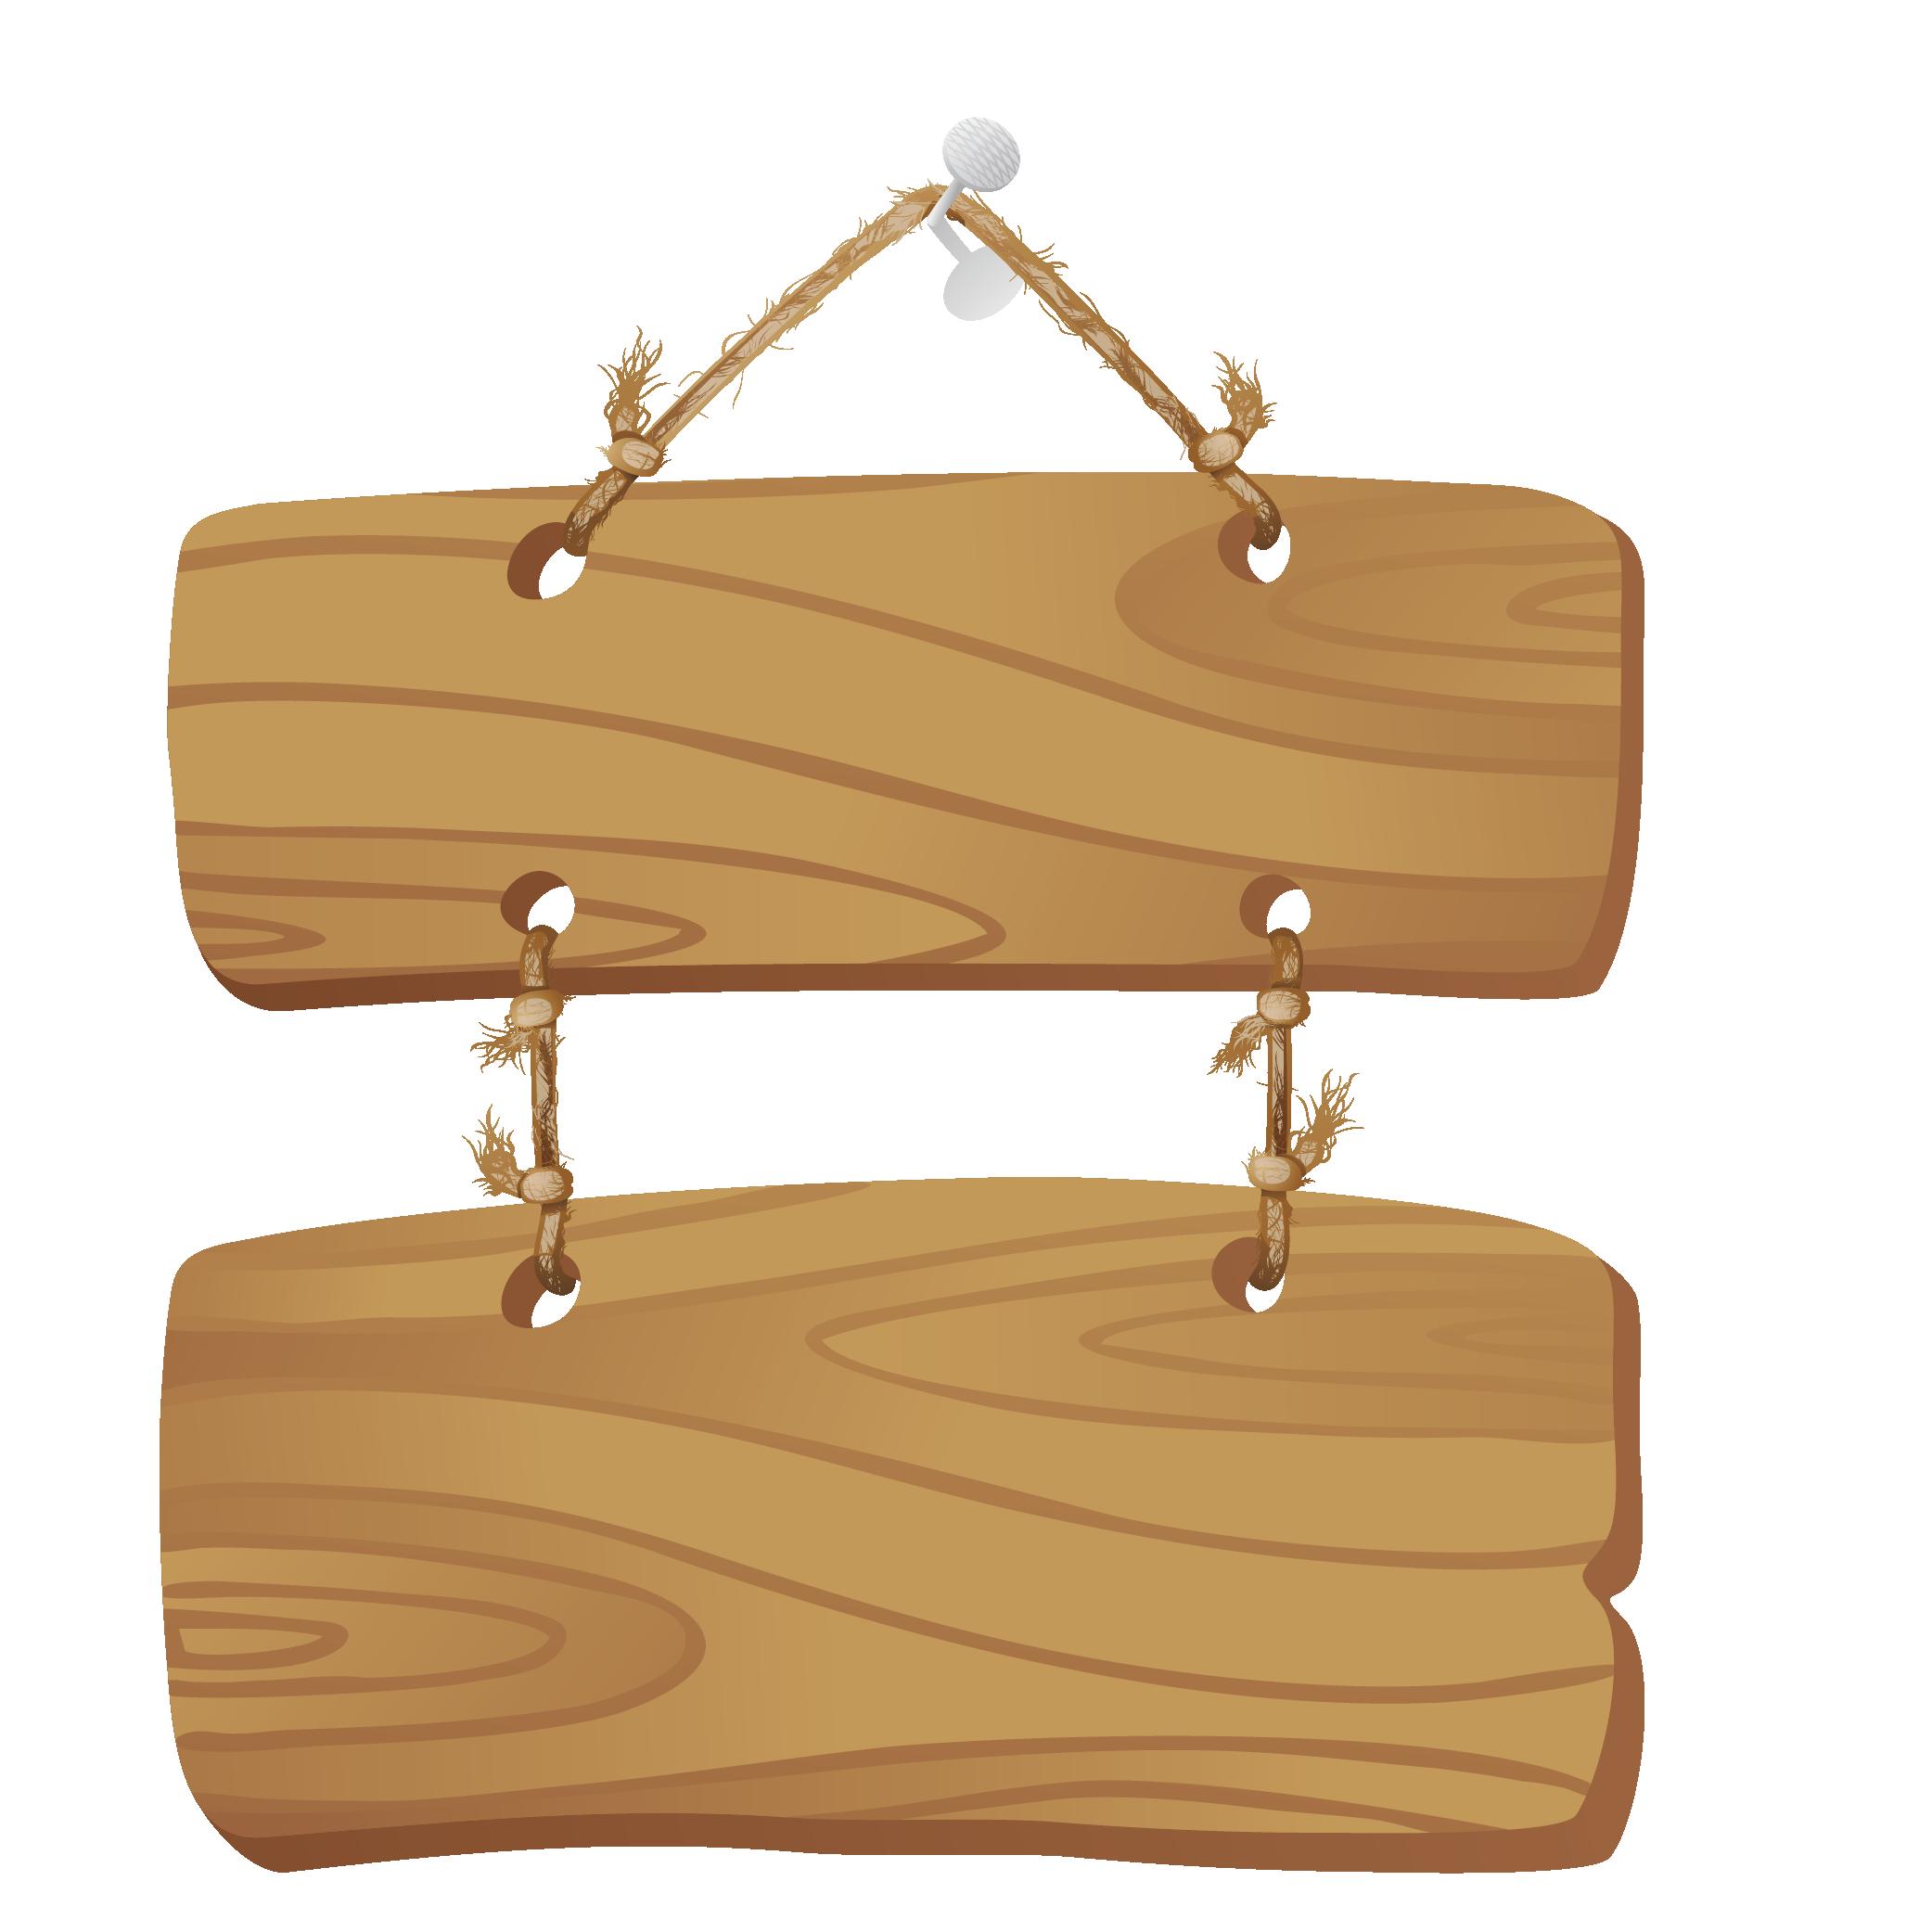 jpg Plank clipart. Wood clip art logo.